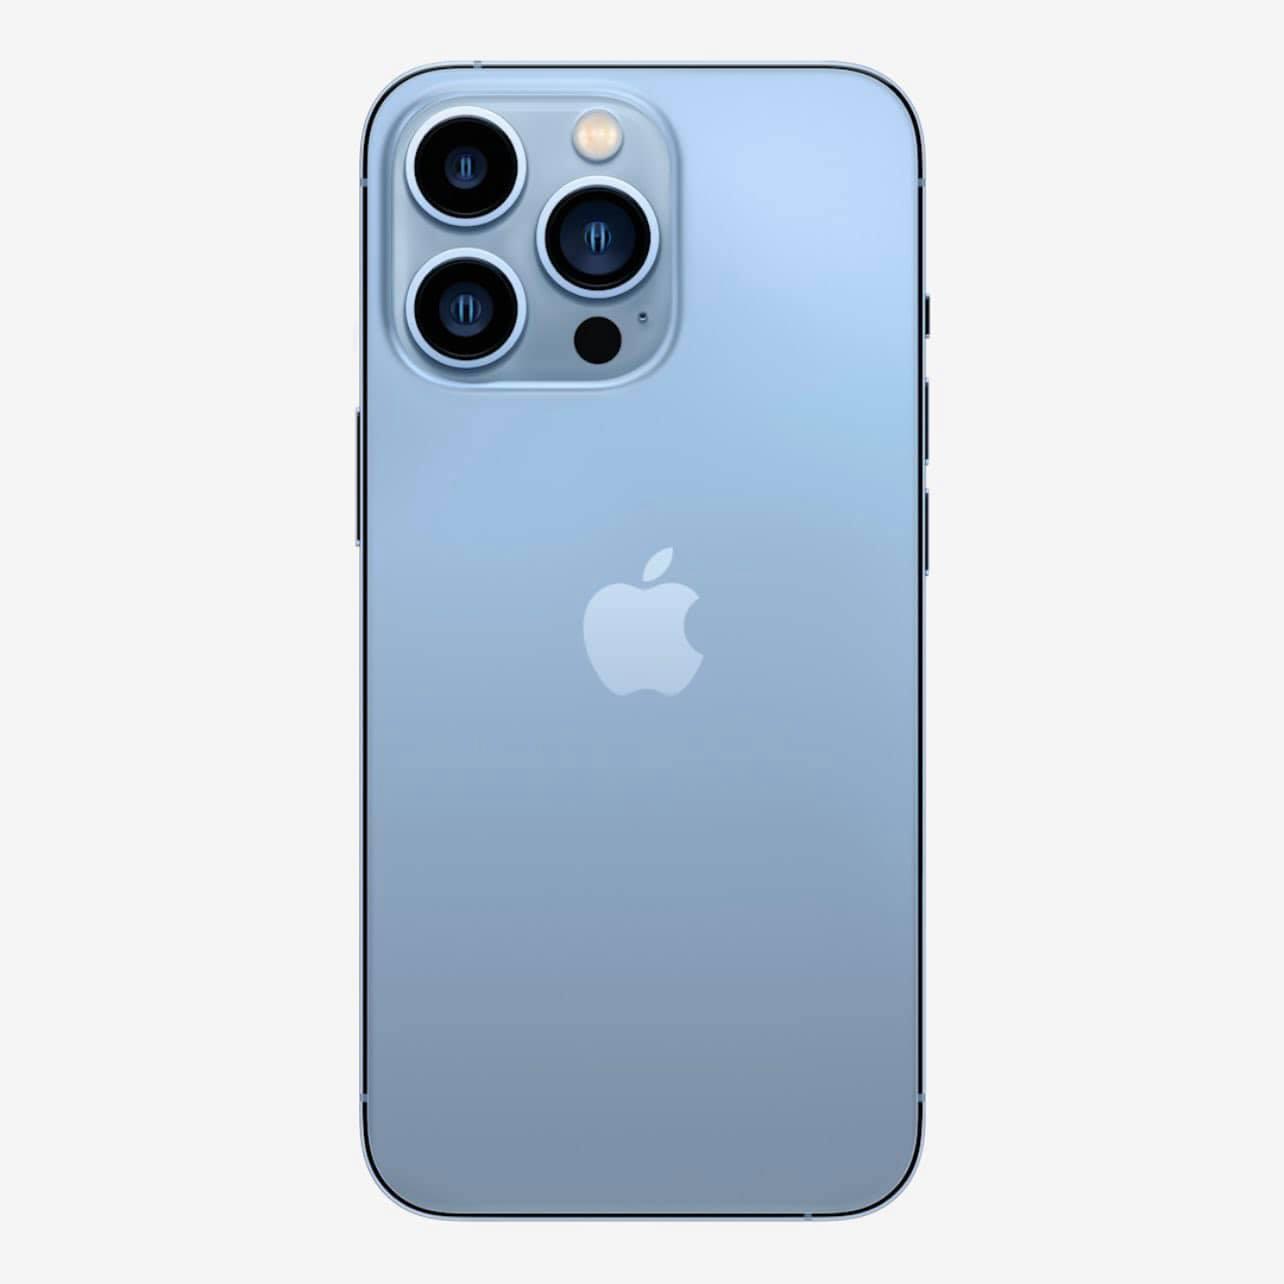 مقارنة بين ايفون 13 وايفون 13 برو ماكس وايباد ميني apple watch series 7